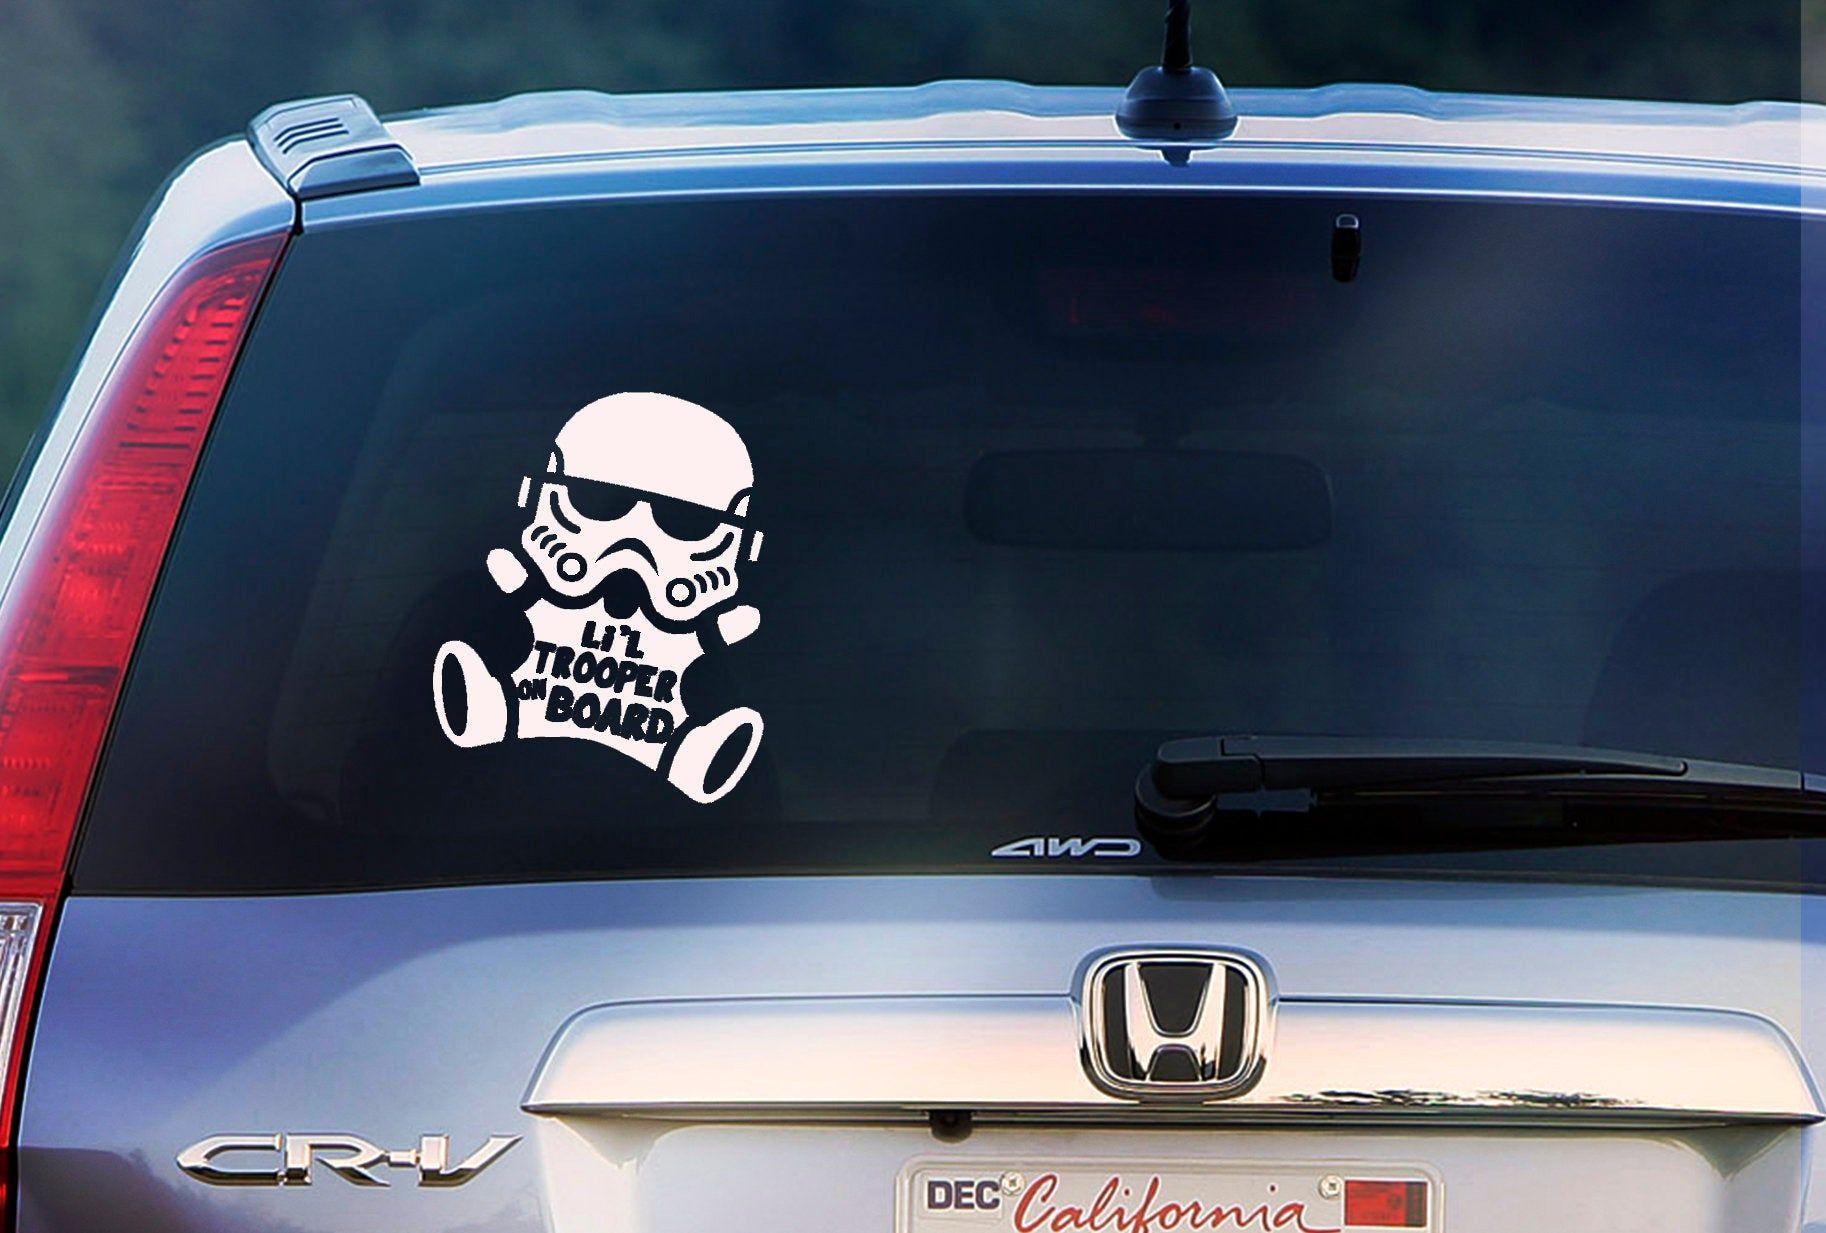 Li L Trooper On Board Baby Star Wars Car Sticker Car Window Decal Sticker Wall Sticker Labtop Decal Vinyl Art In Vari Star Wars Baby Window Decals Trooper [ 1233 x 1826 Pixel ]